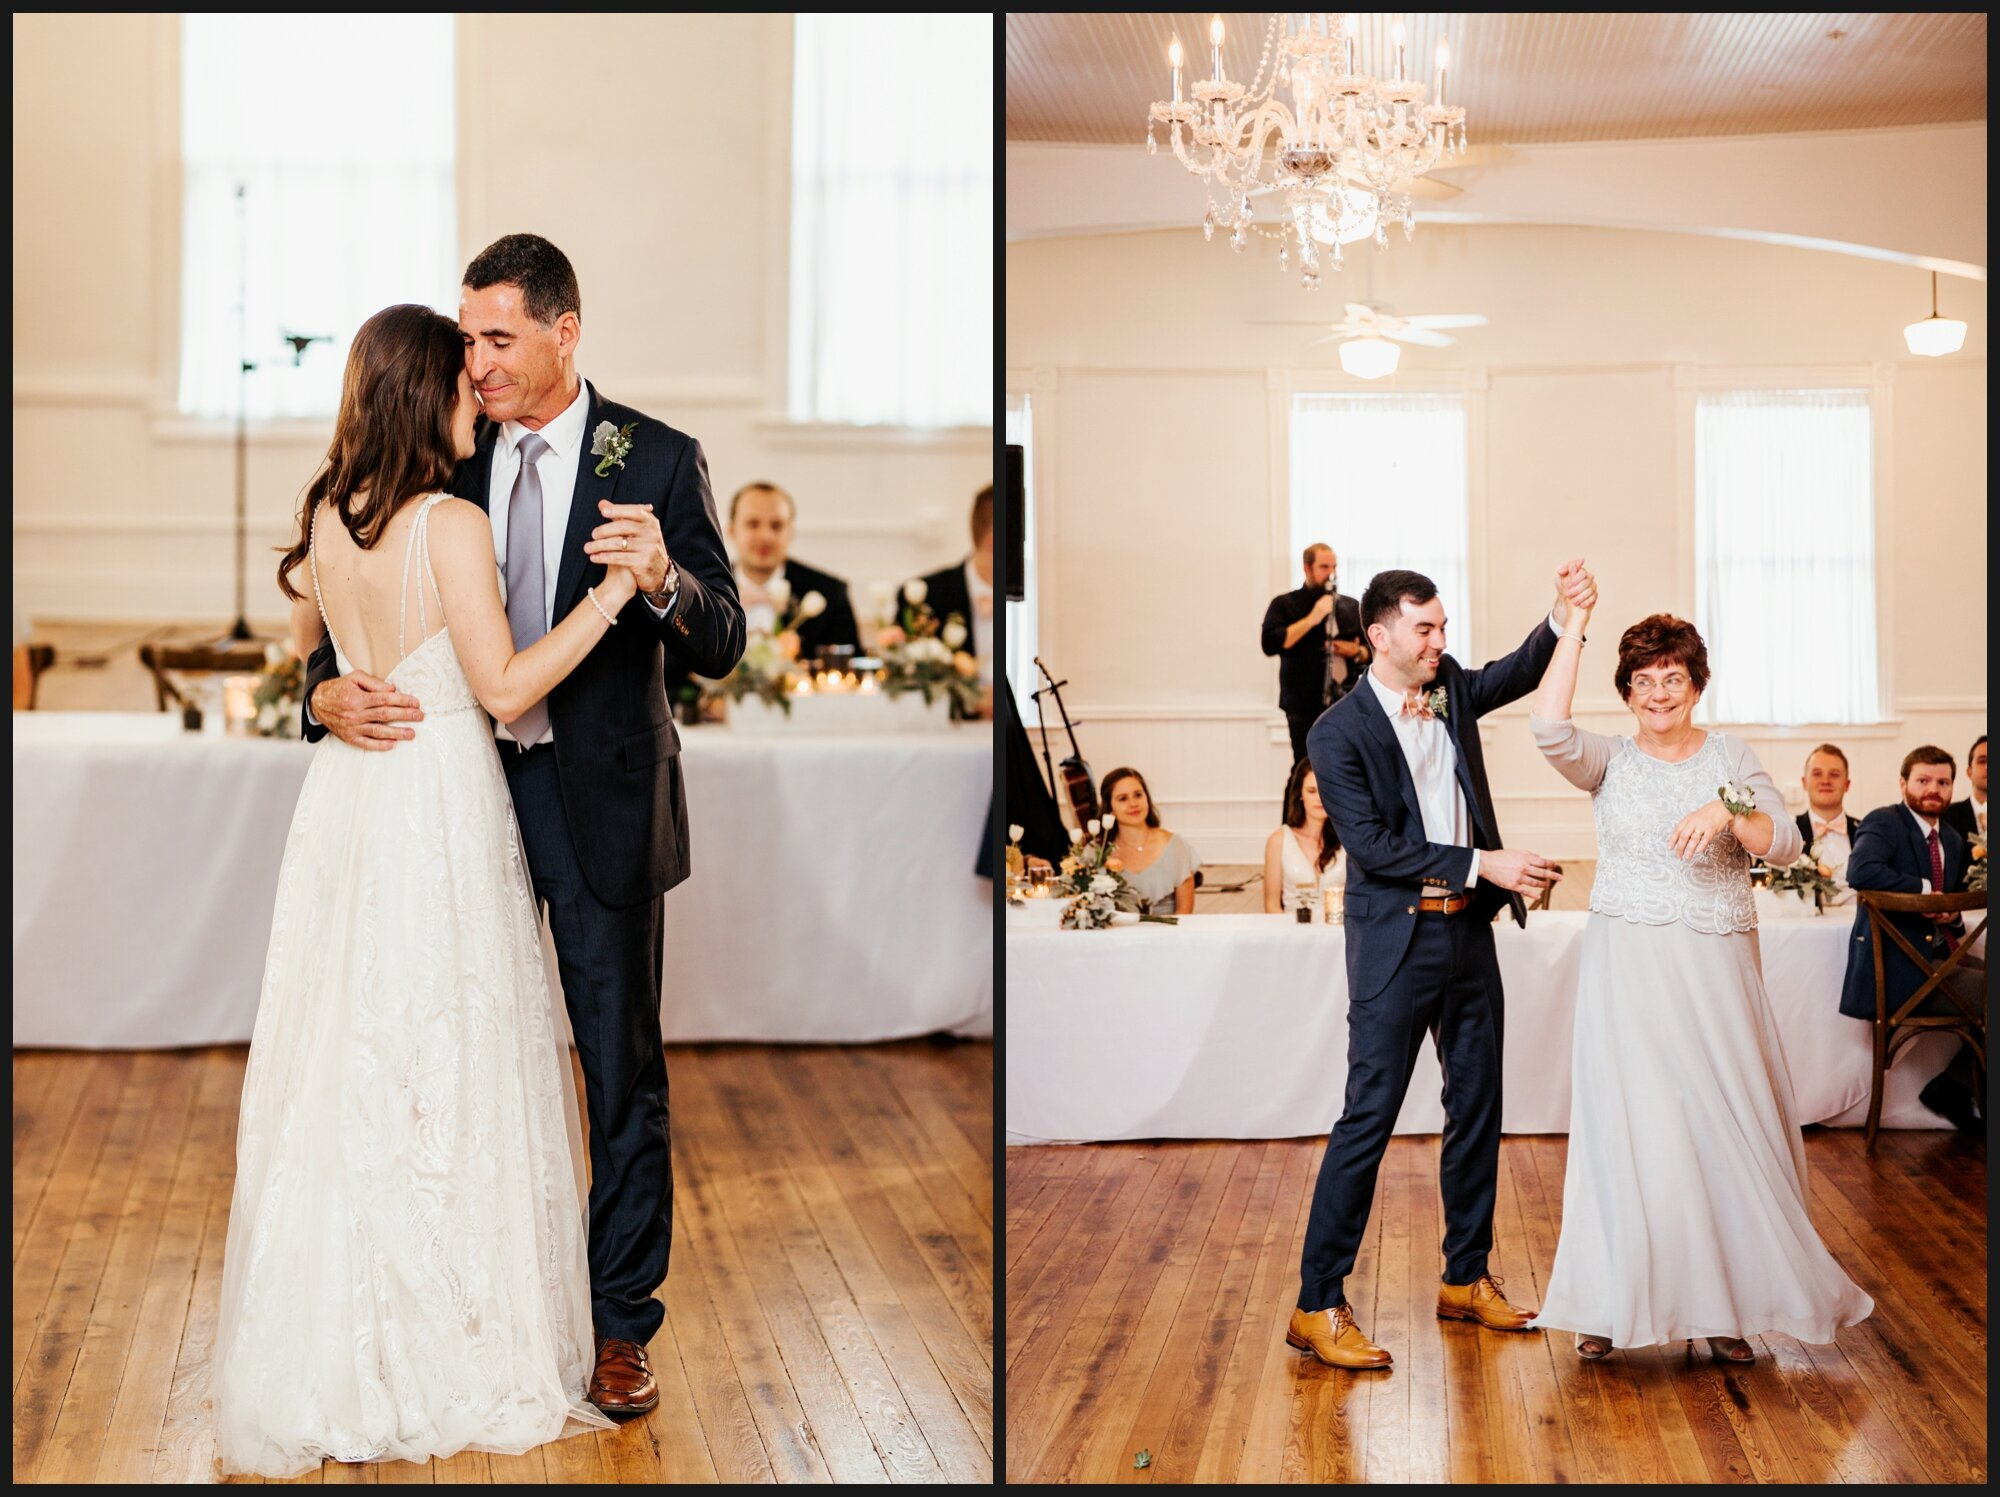 Orlando-Wedding-Photographer-destination-wedding-photographer-florida-wedding-photographer-hawaii-wedding-photographer_0636.jpg